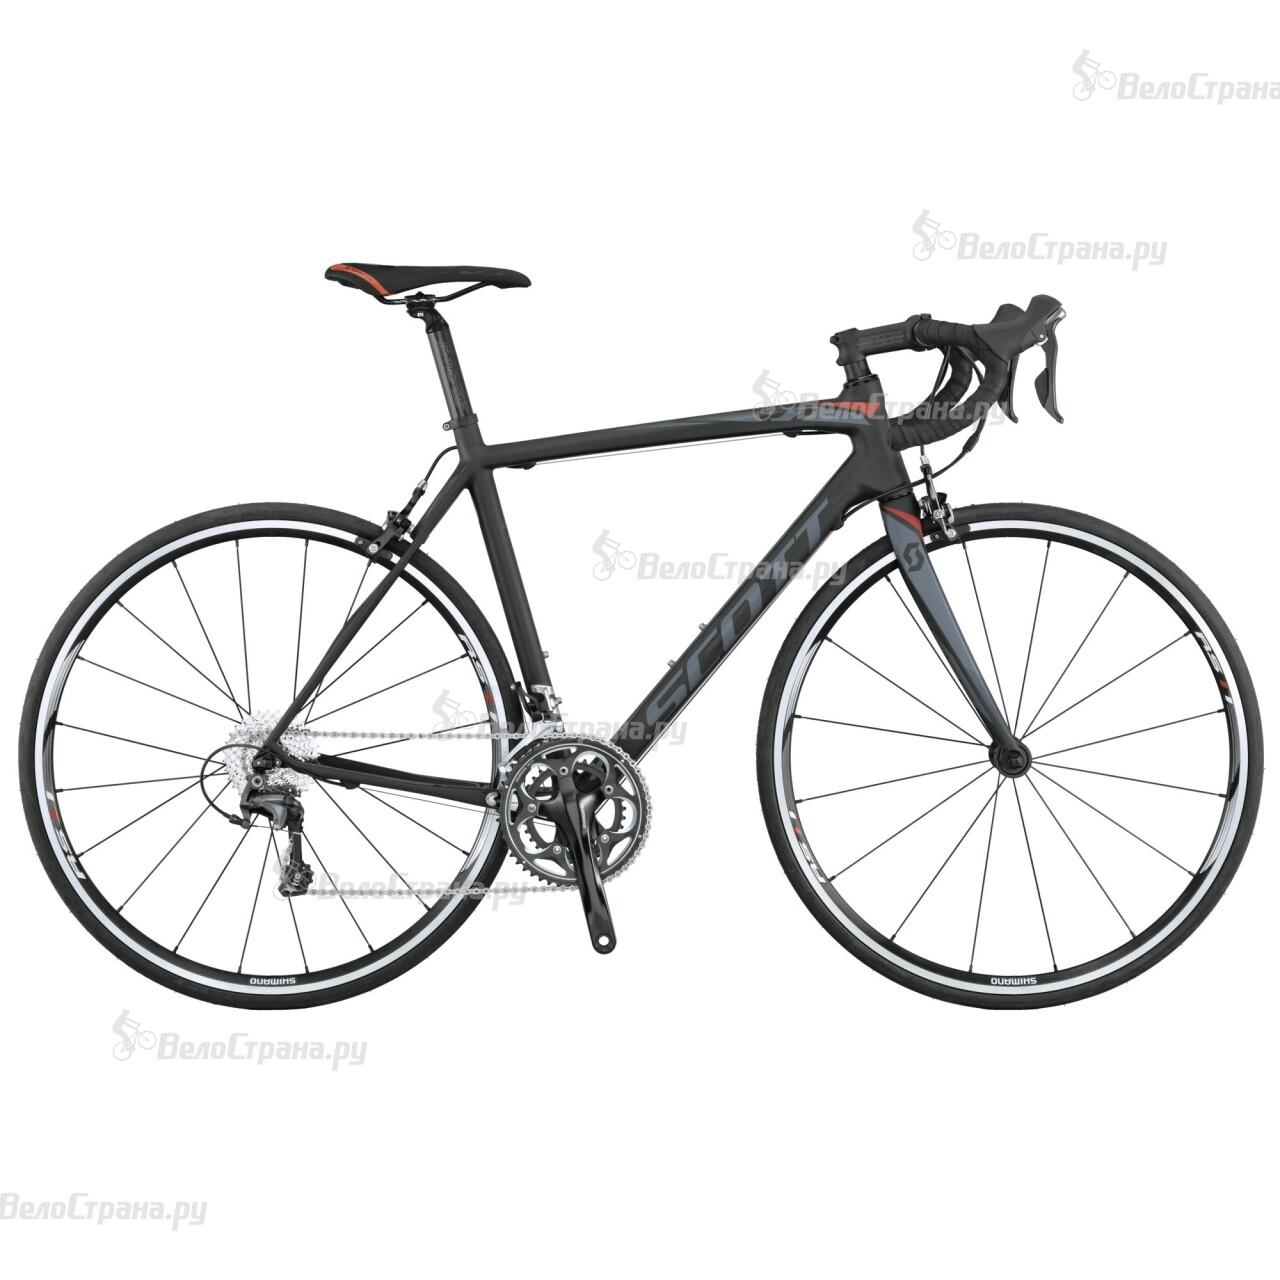 Велосипед Scott CR1 10 (2015) велосипед scott cr1 20 2017